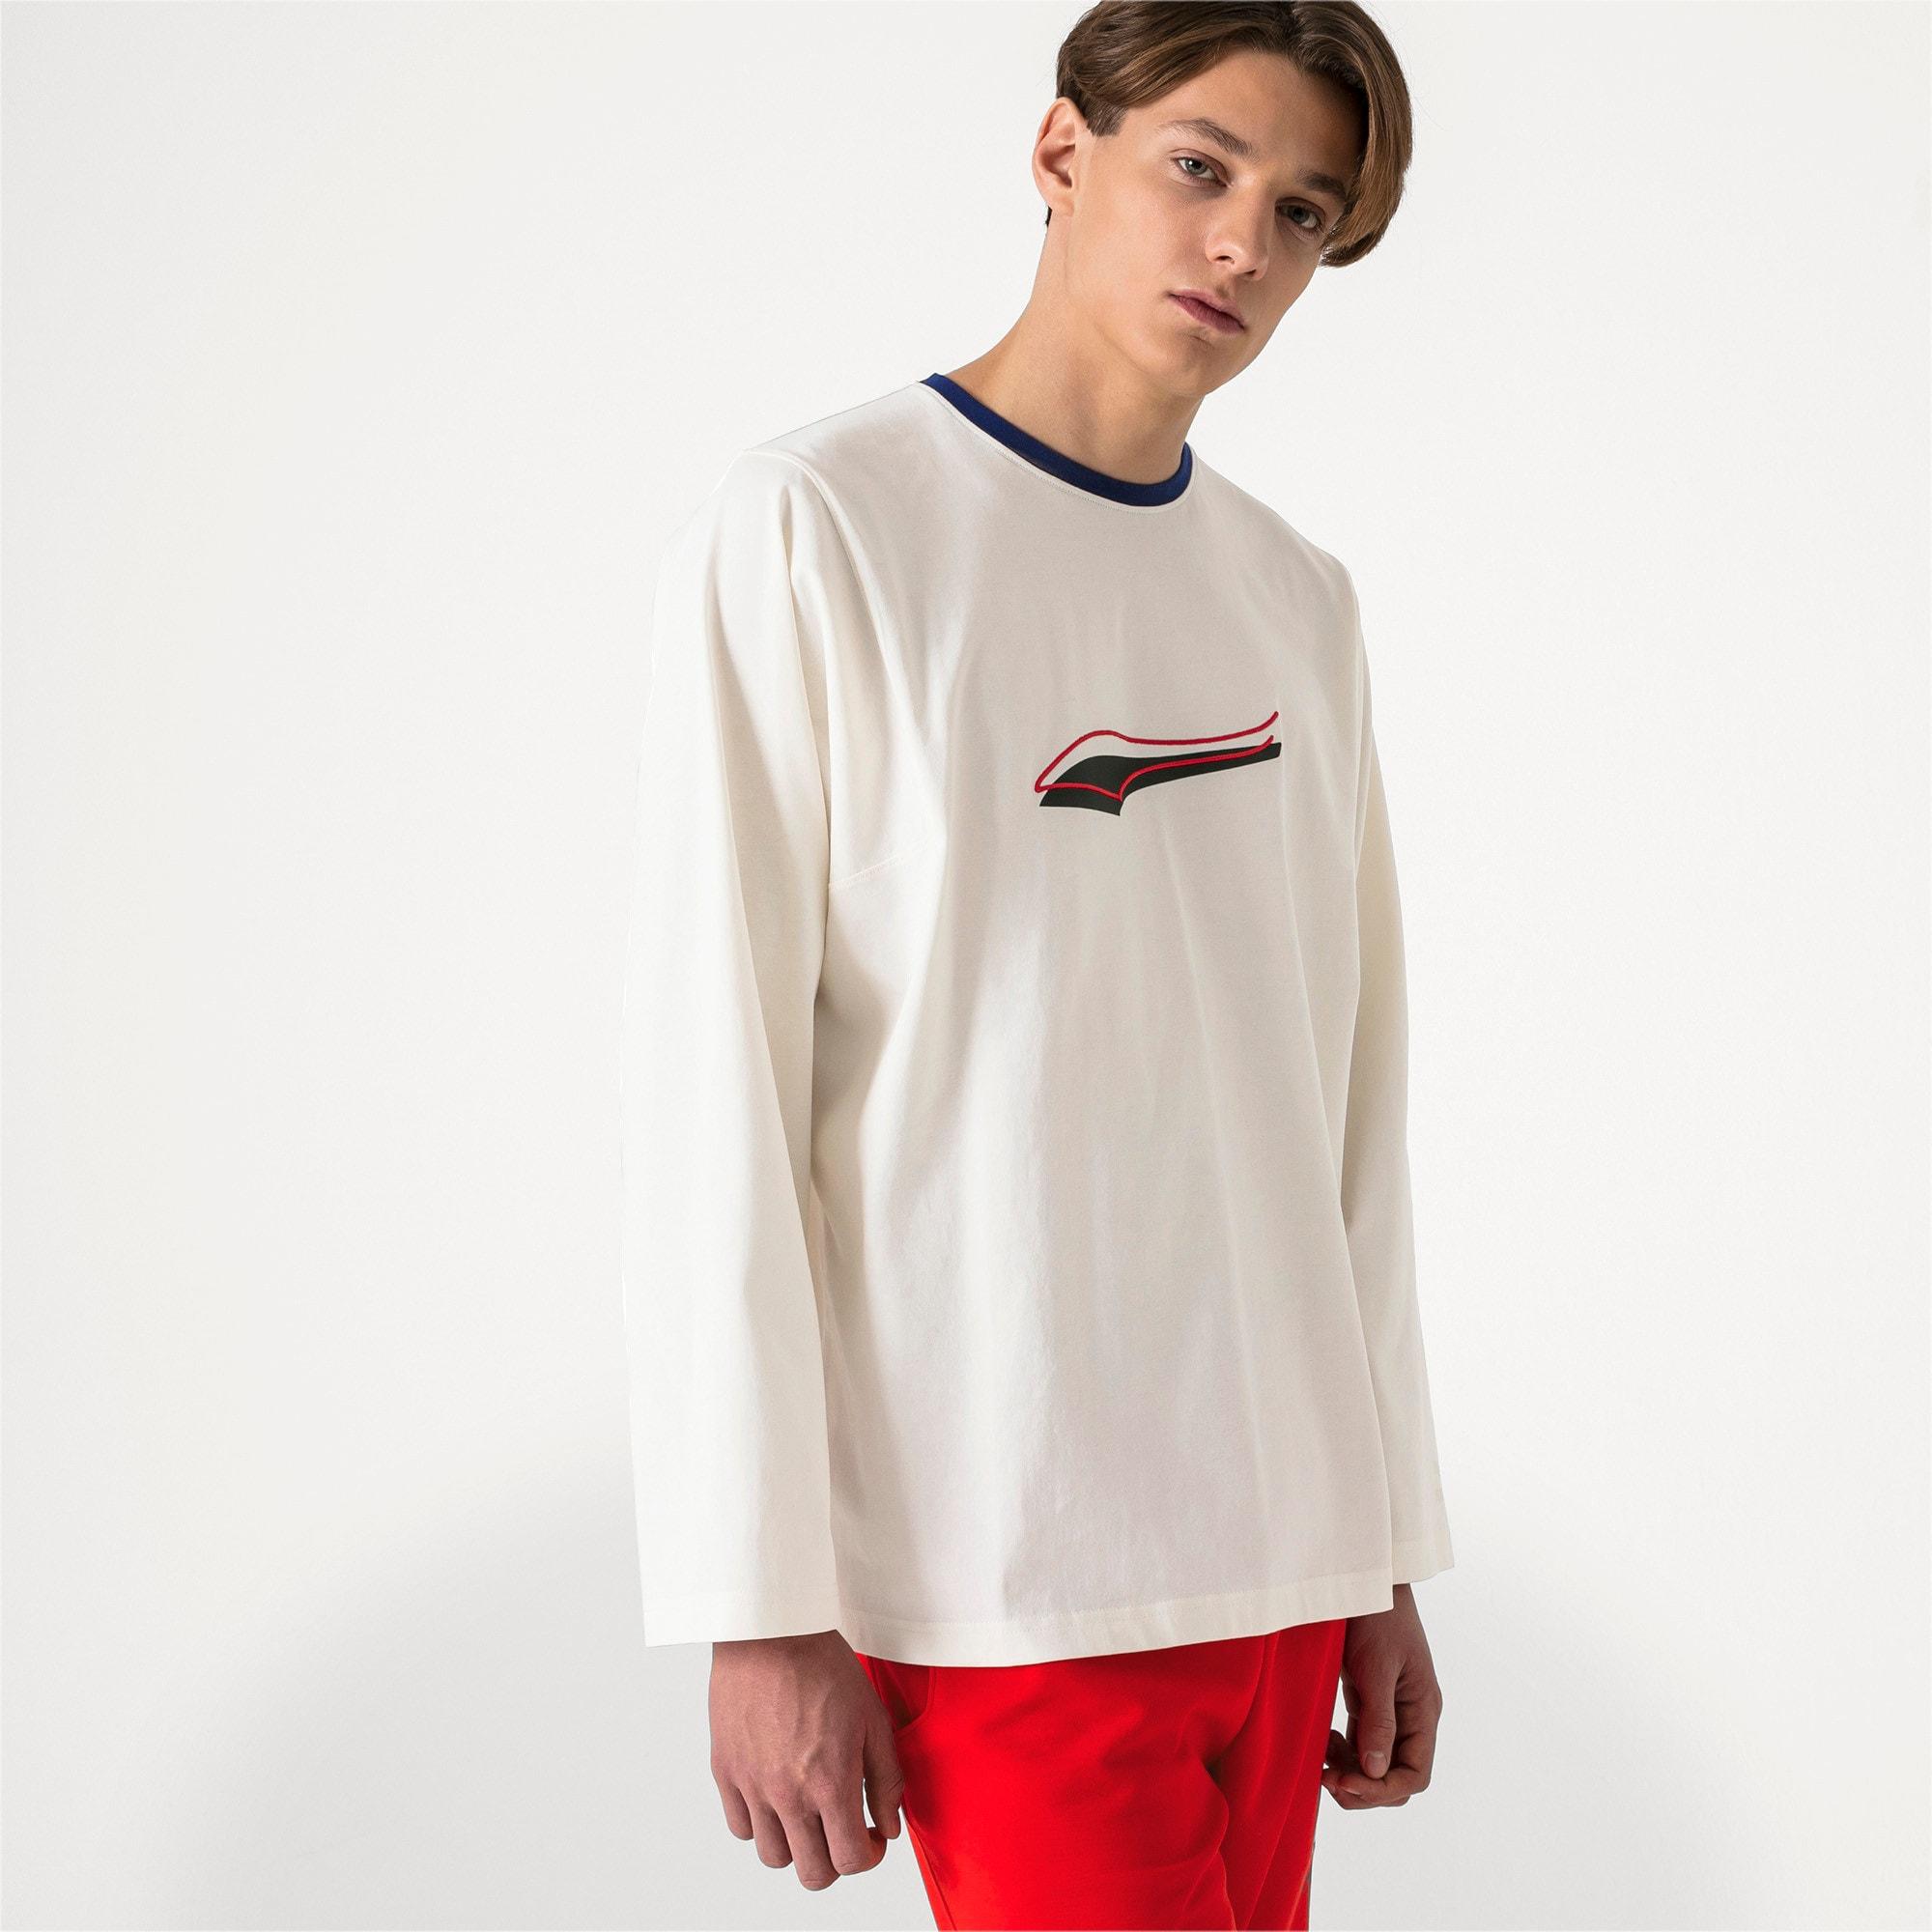 Thumbnail 2 of PUMA x ADER ERROR Langarm-Shirt, Whisper White, medium